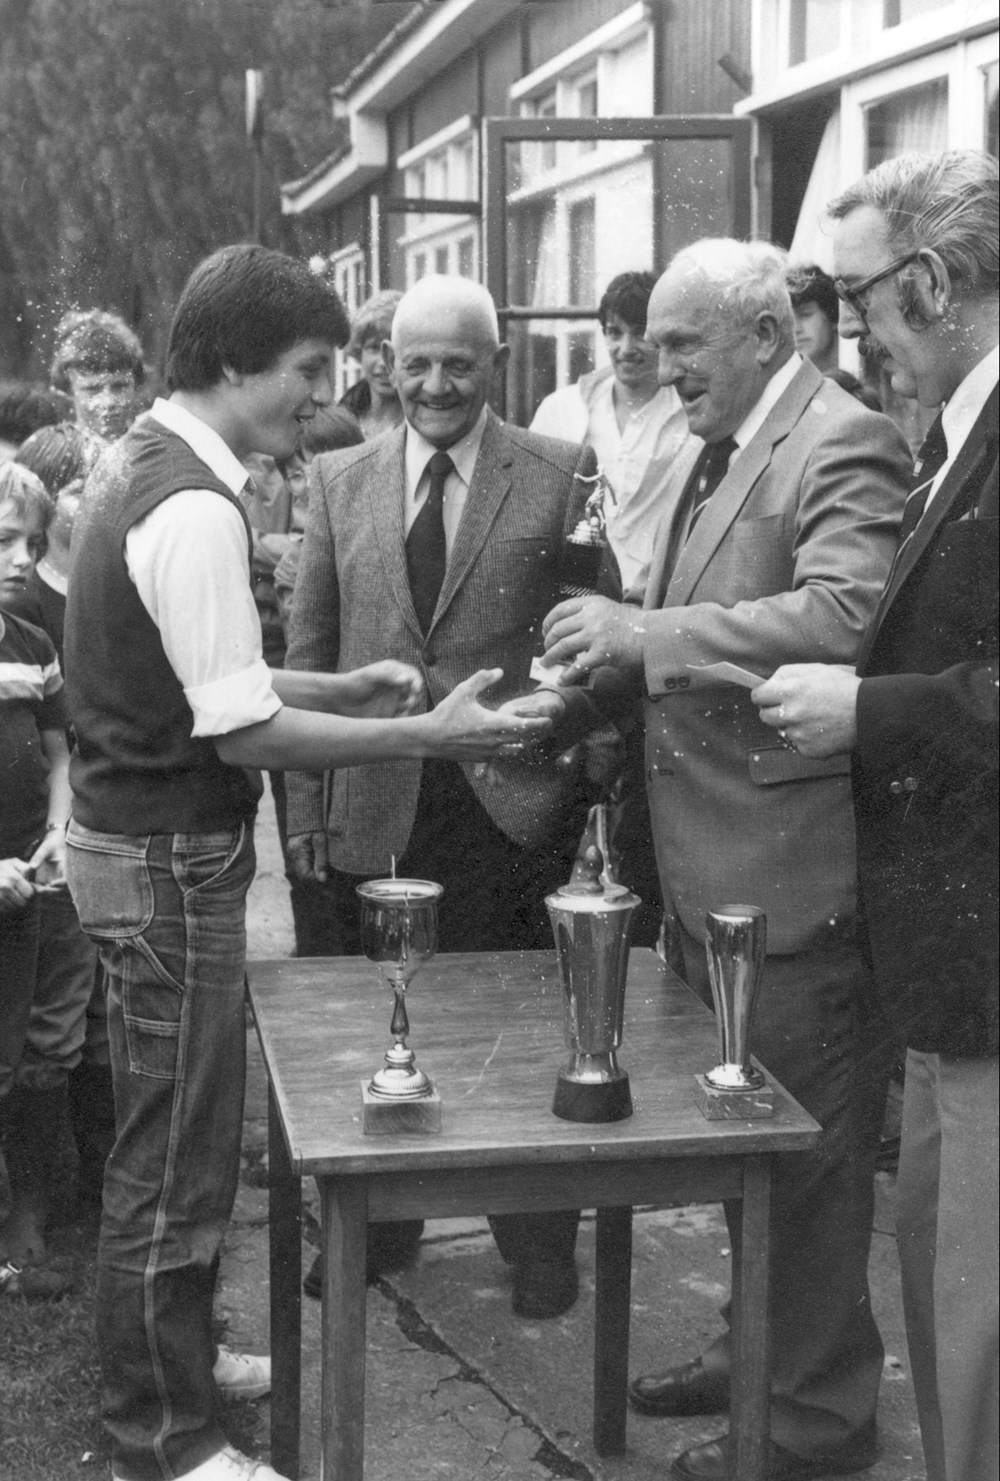 1980 Verenigingsleven P.J. Backers-toernooi (A-jeugd)